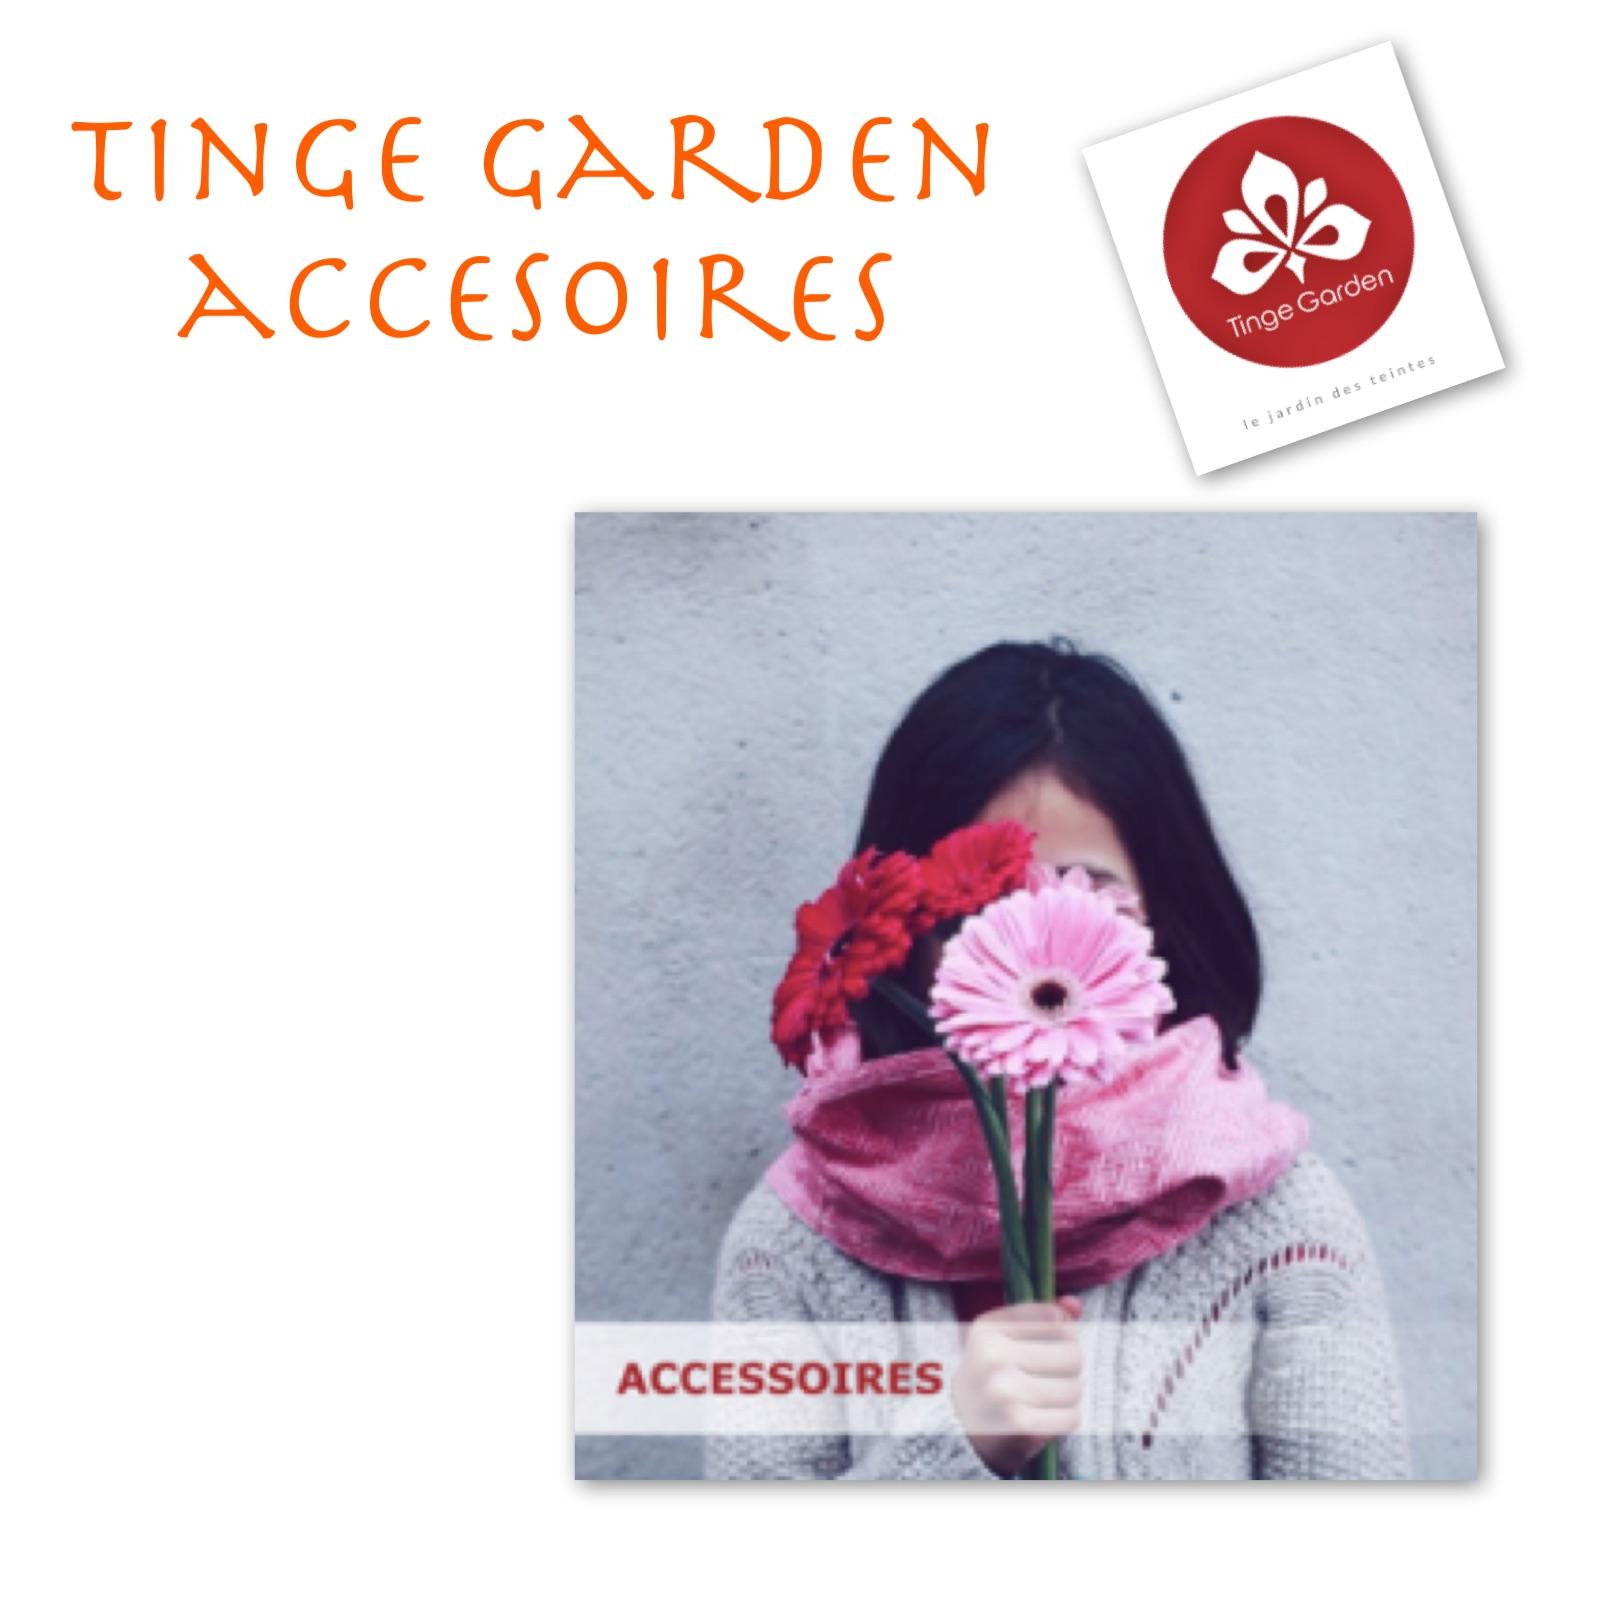 Accessoires Tinge Garden